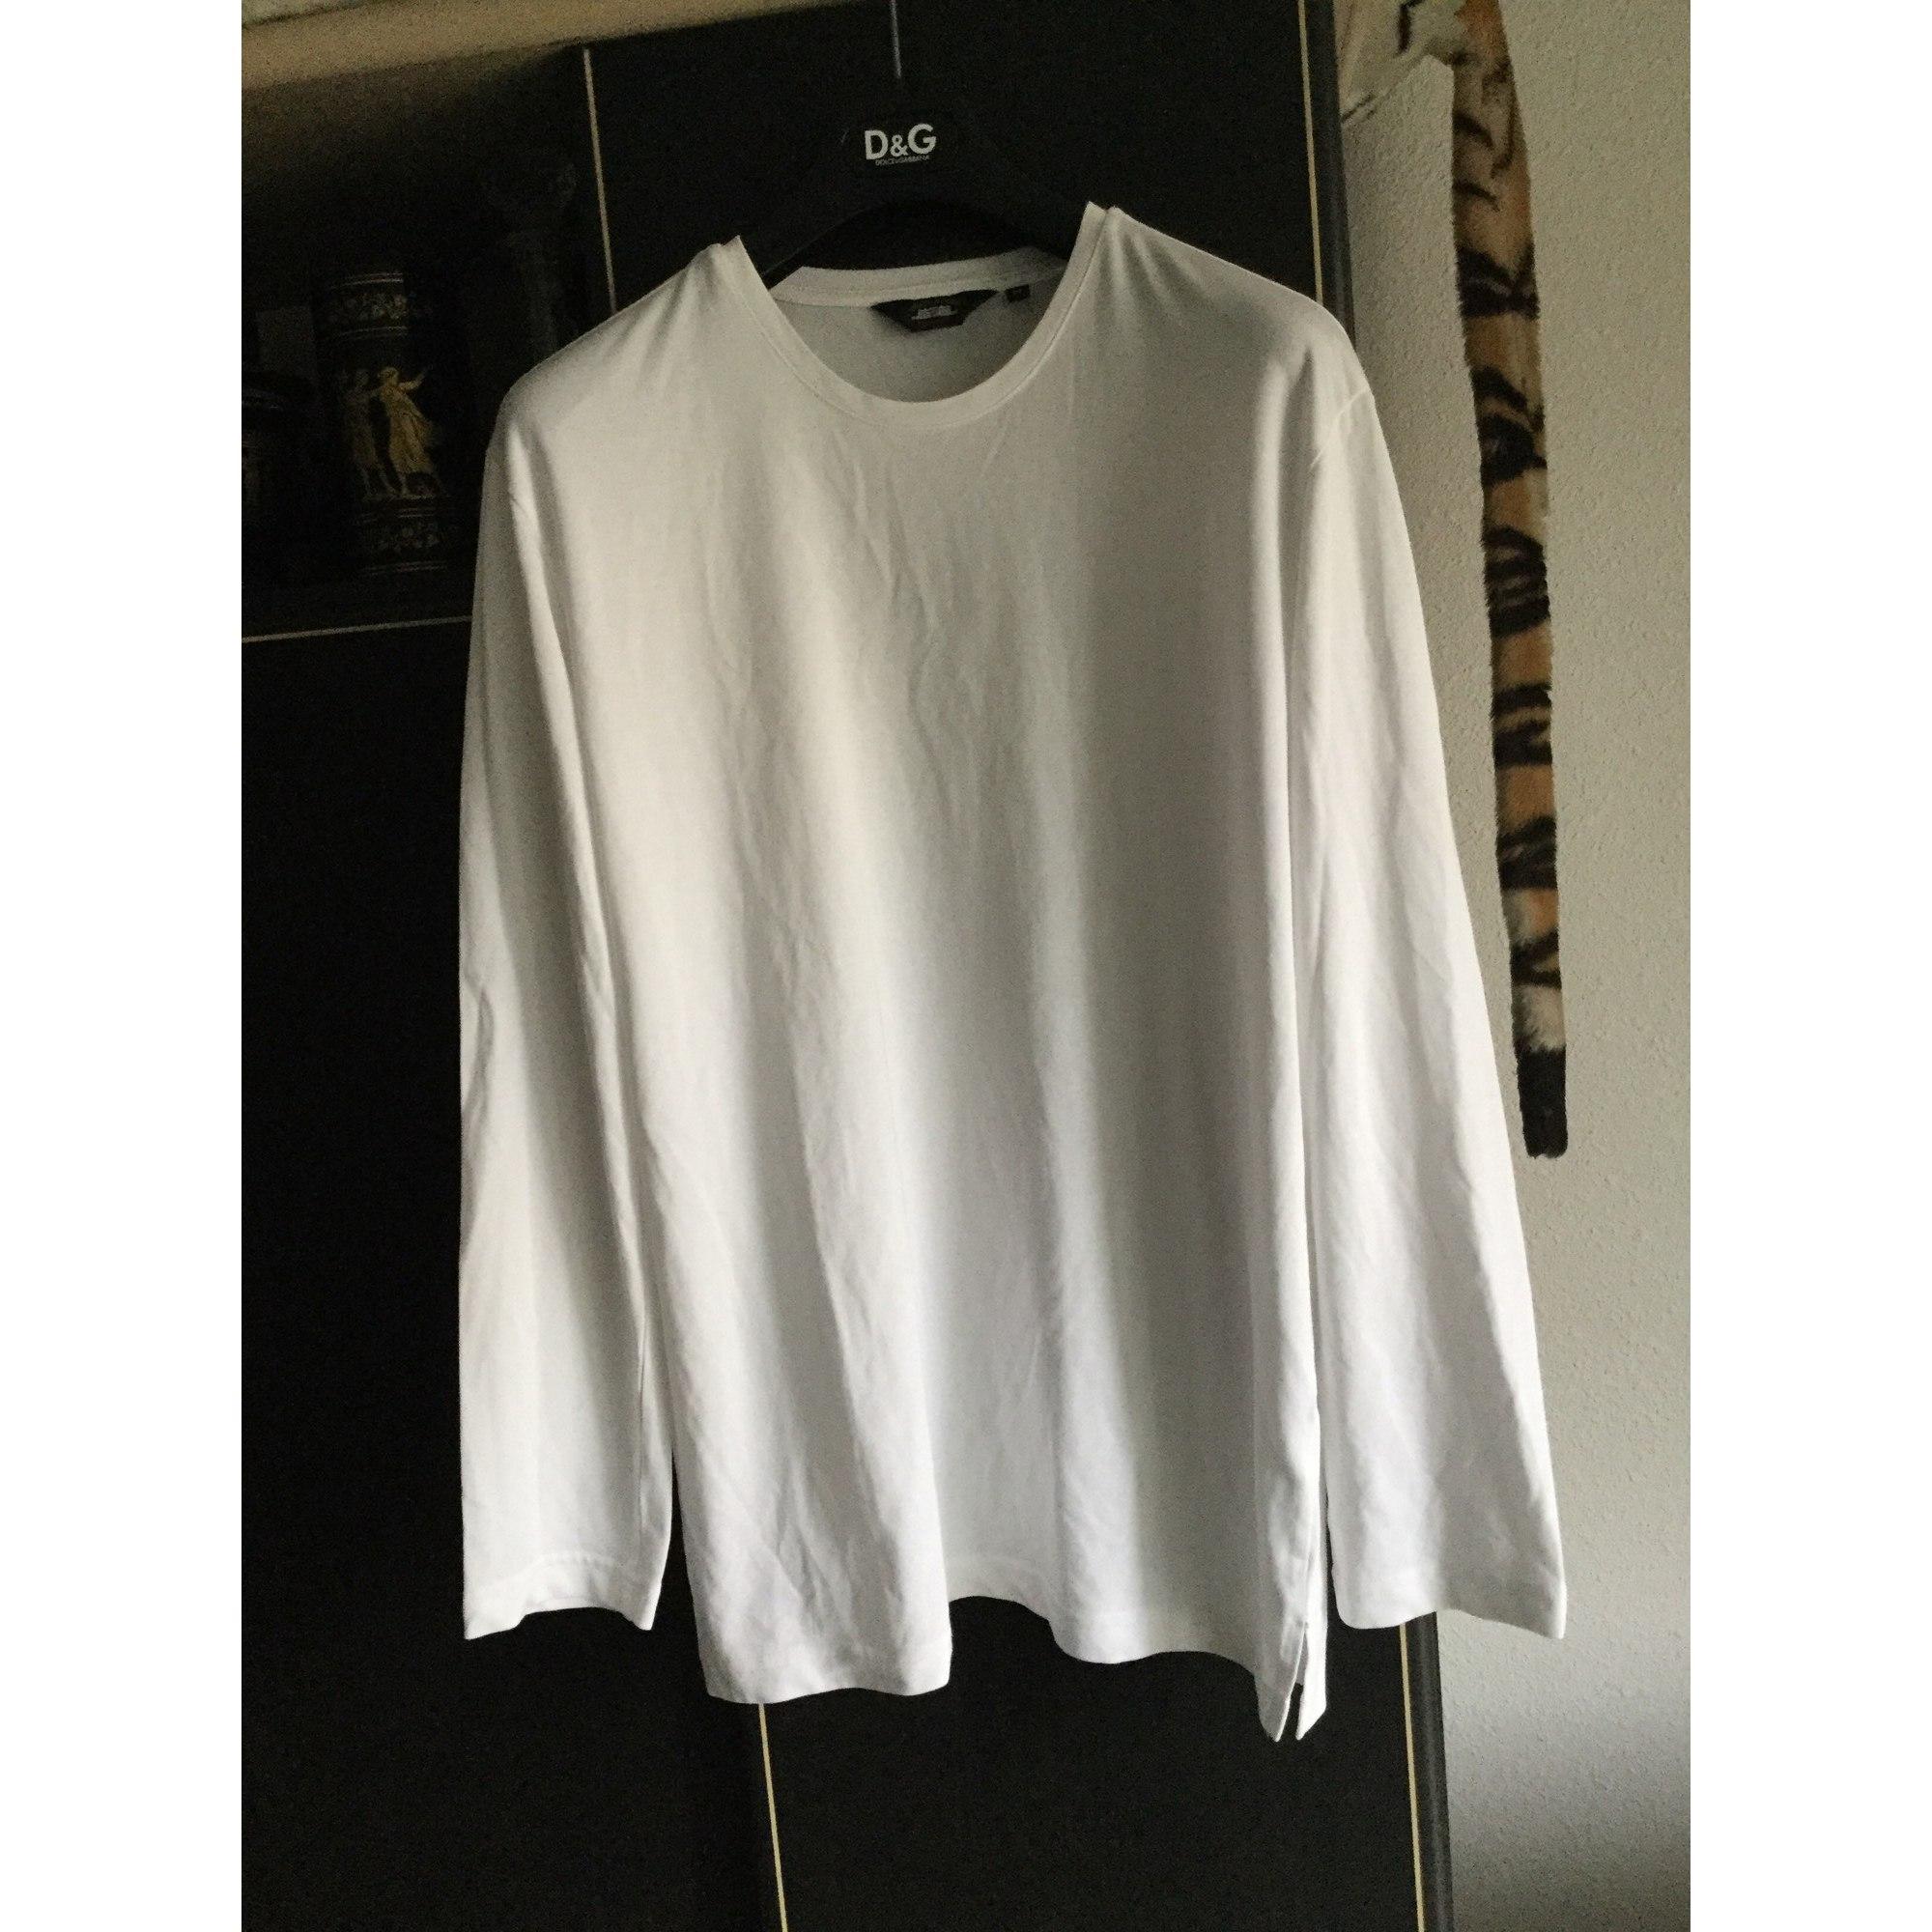 Tee-shirt MARQUE INCONNUE Blanc, blanc cassé, écru